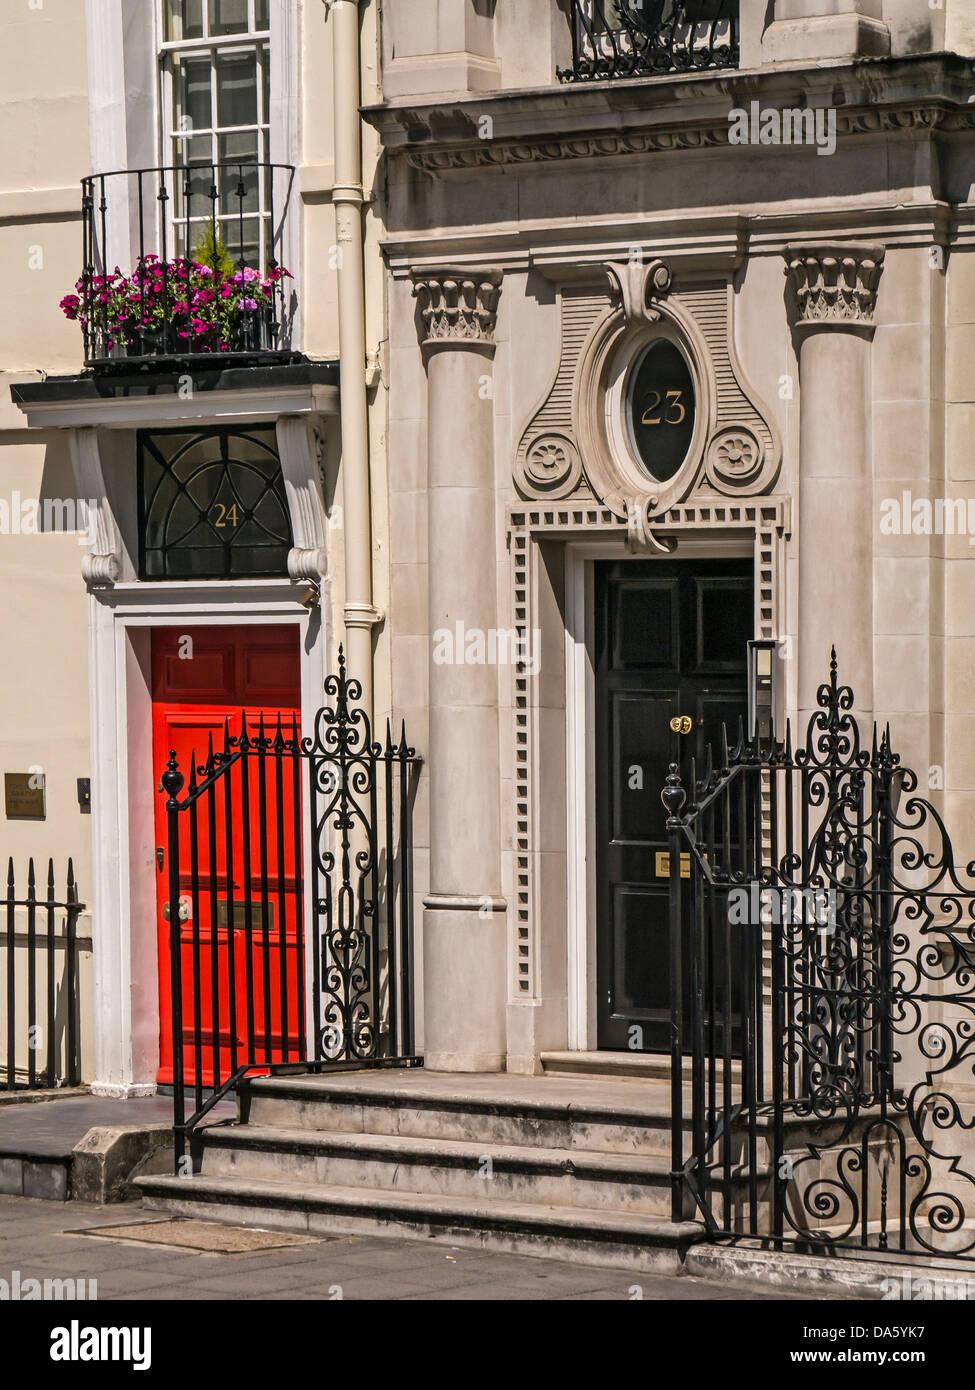 Door to Georgian house in Berkley Square, Mayfair, London - Stock Image